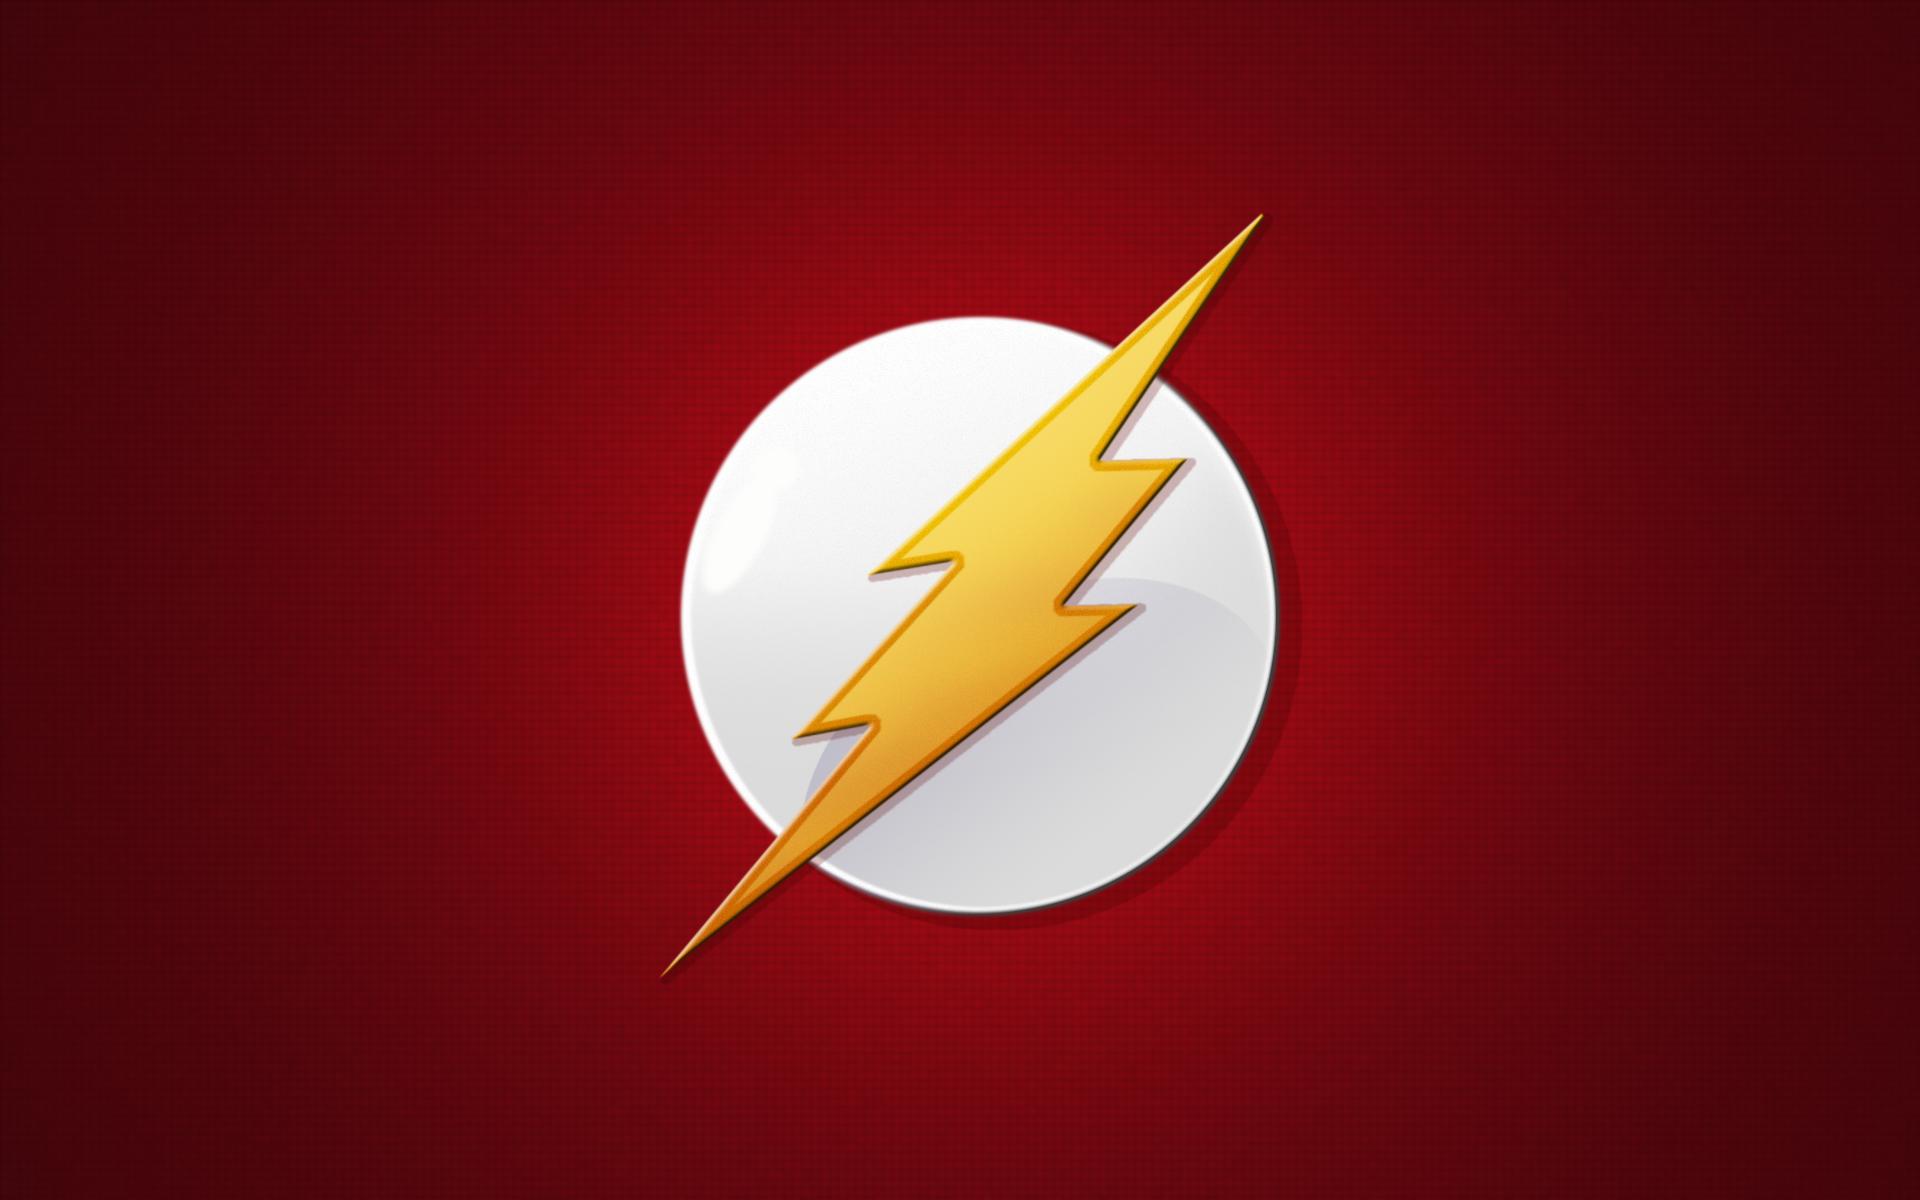 The Flash would be a GOD coalescecreative 1920x1200